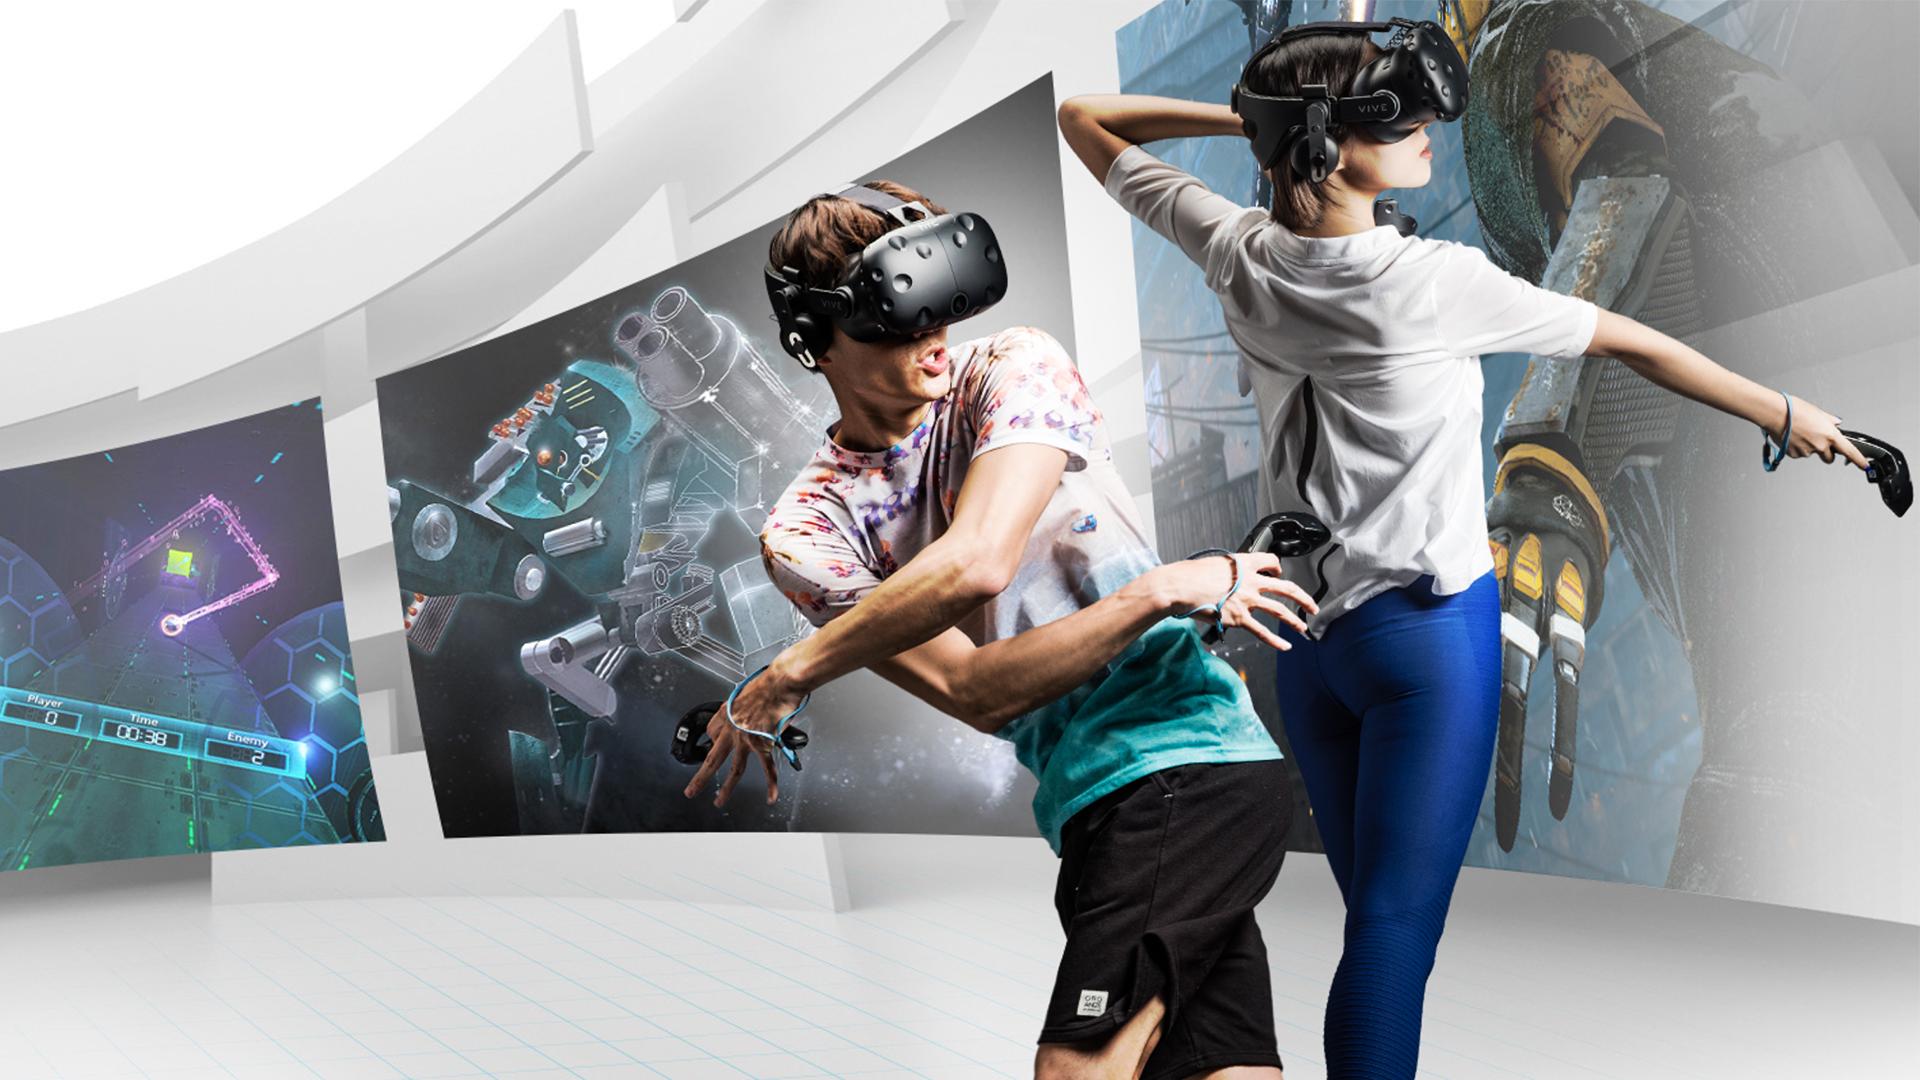 Service_VR_Virtual Reality 3D